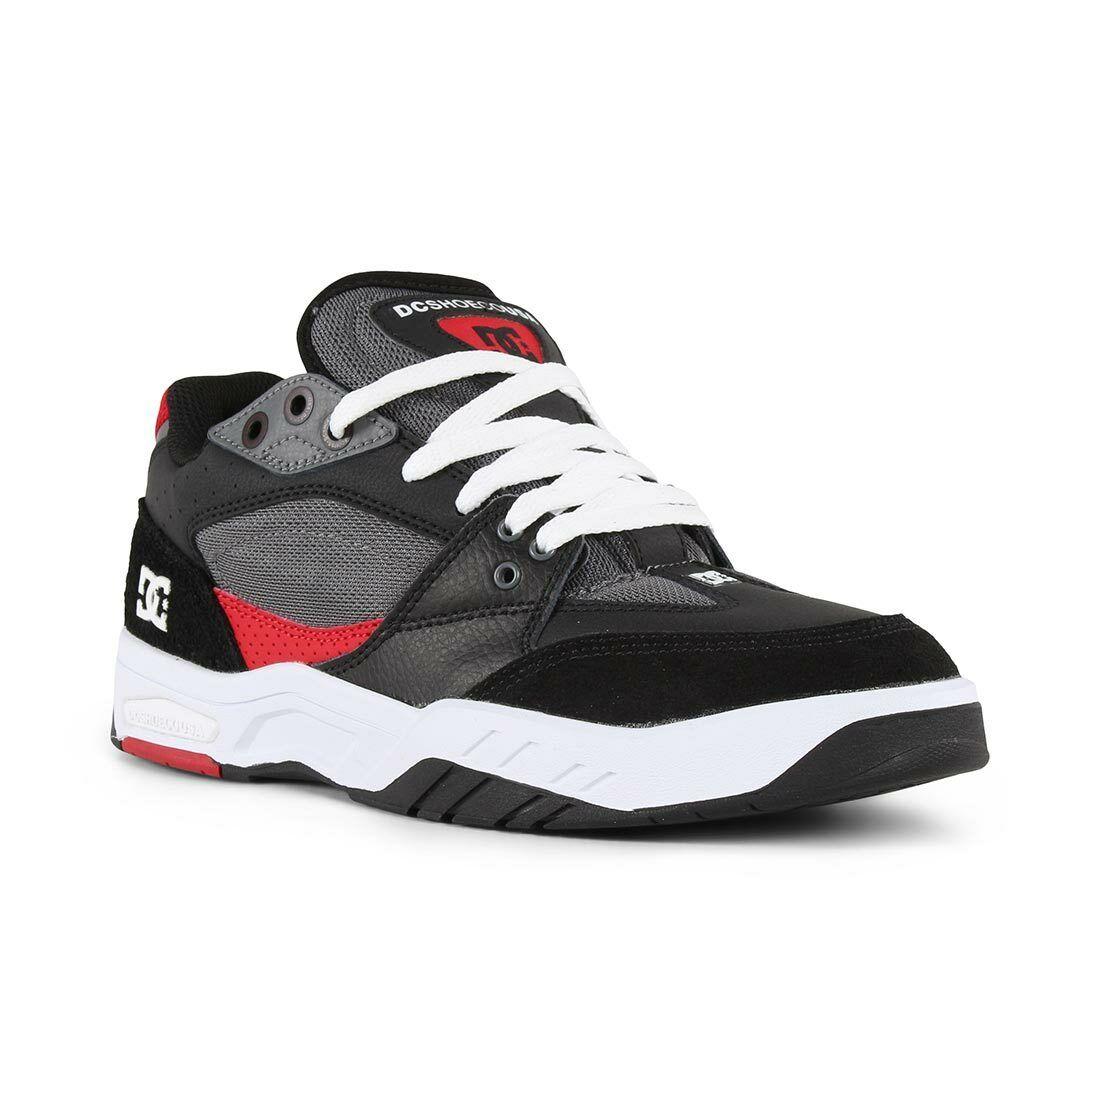 DC Zapatos Maswell-blancoo Negro Rojo